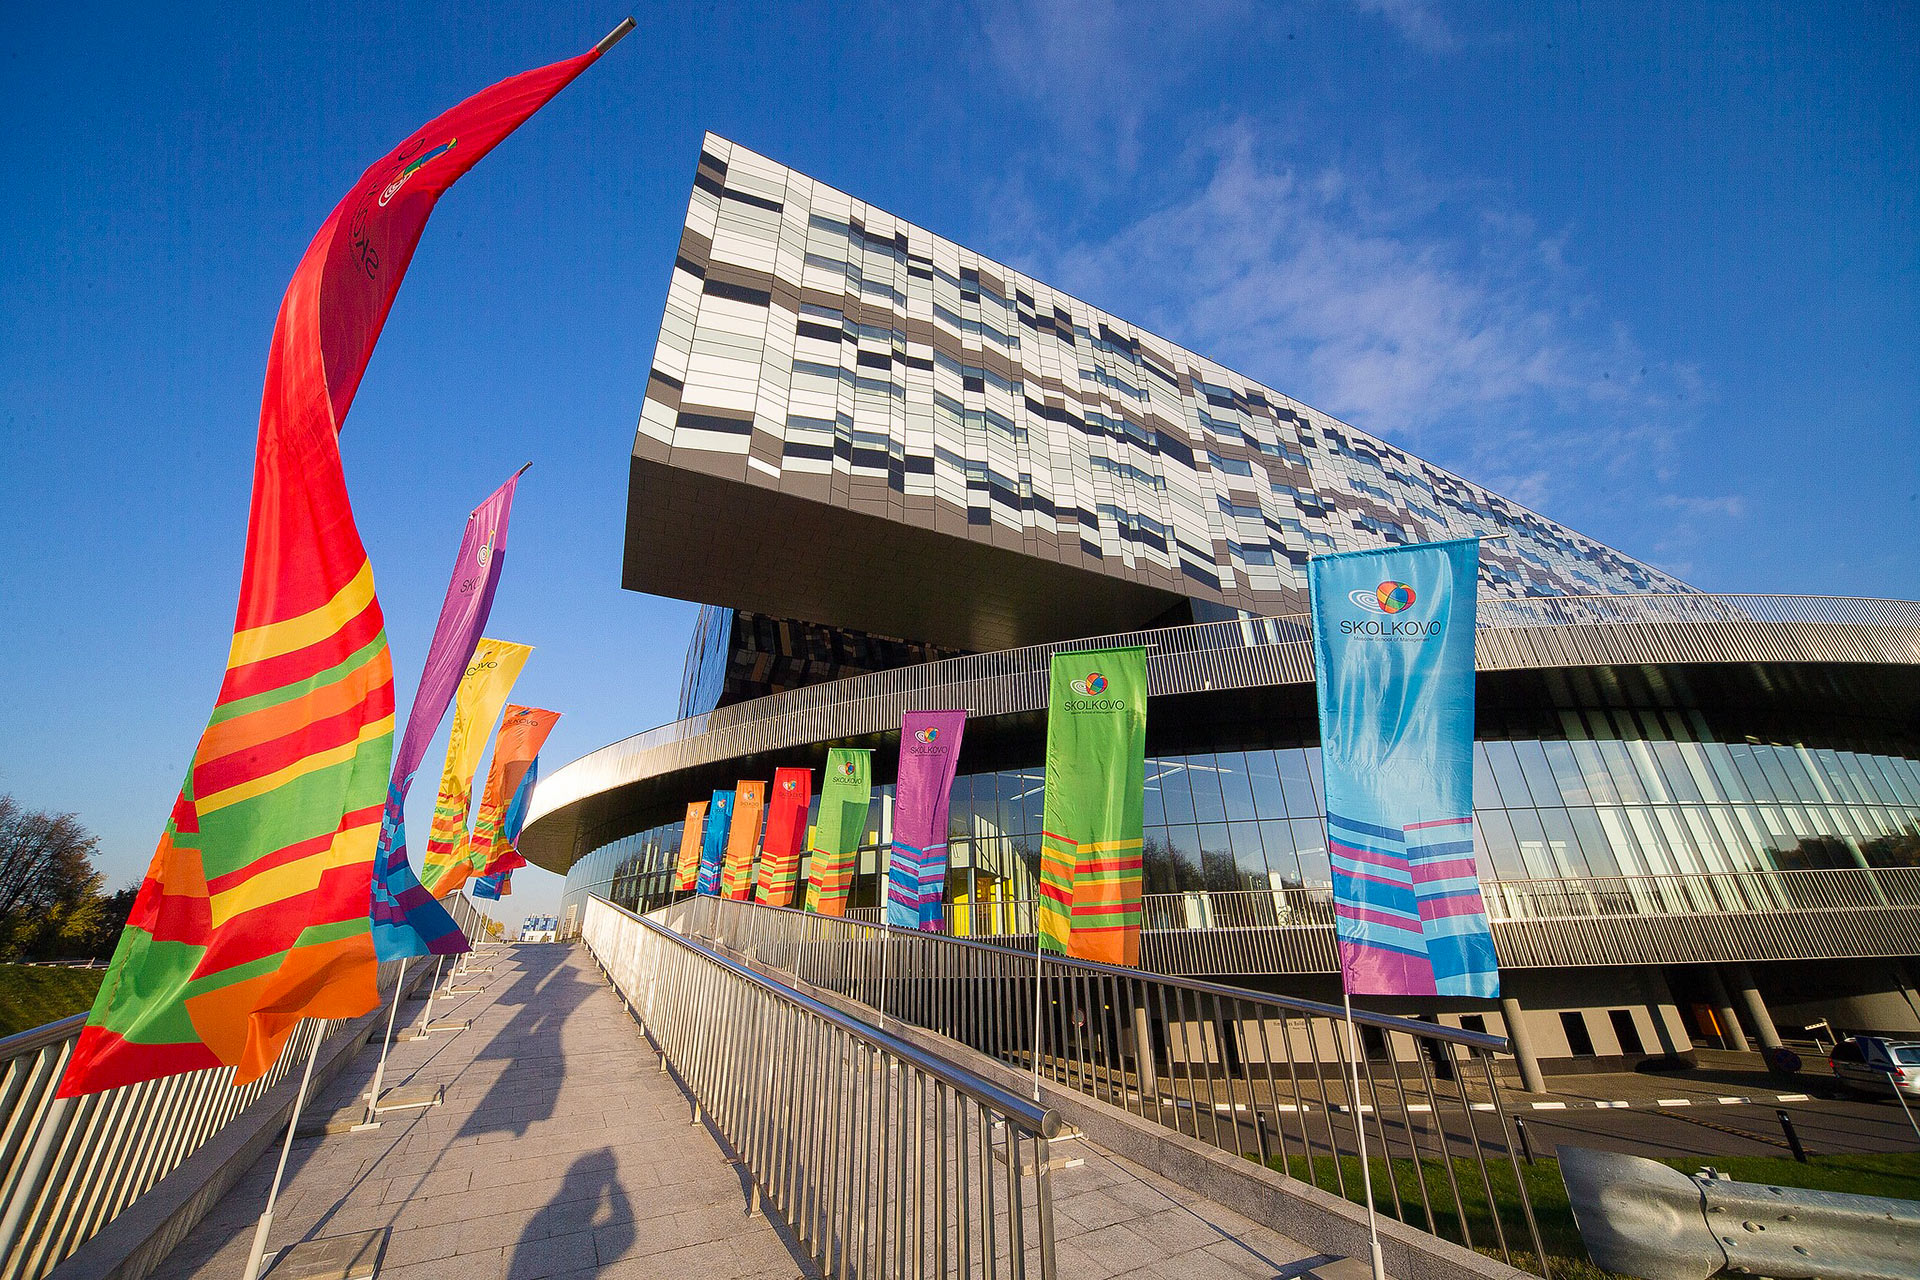 СКОЛКОВО и Unilever запустили программу по устойчивому развитию бизнеса